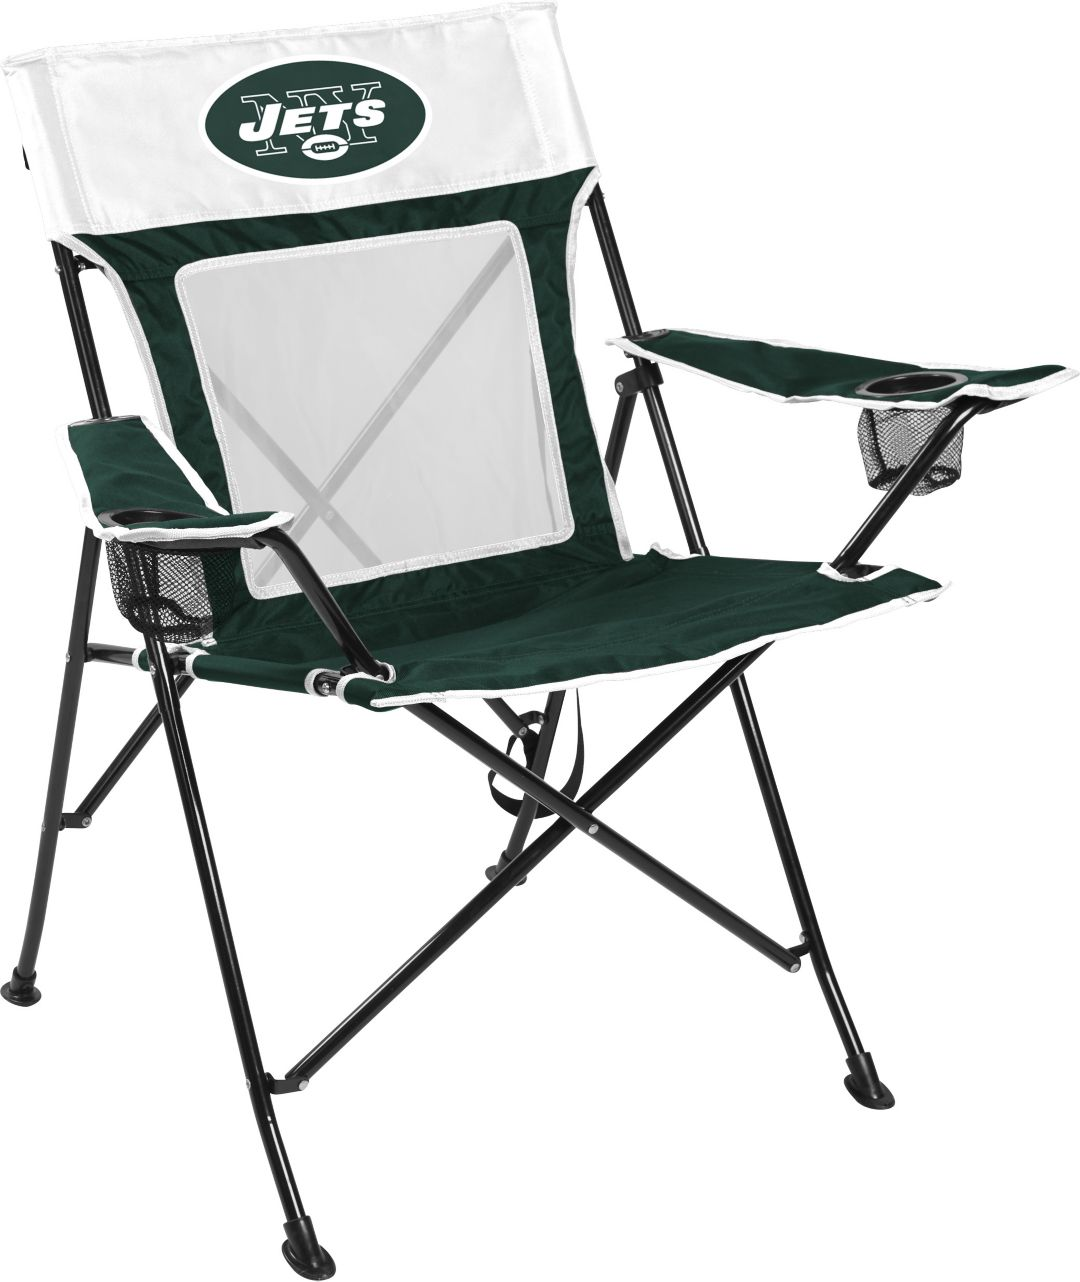 Sensational Rawlings New York Jets Game Changer Chair Beatyapartments Chair Design Images Beatyapartmentscom